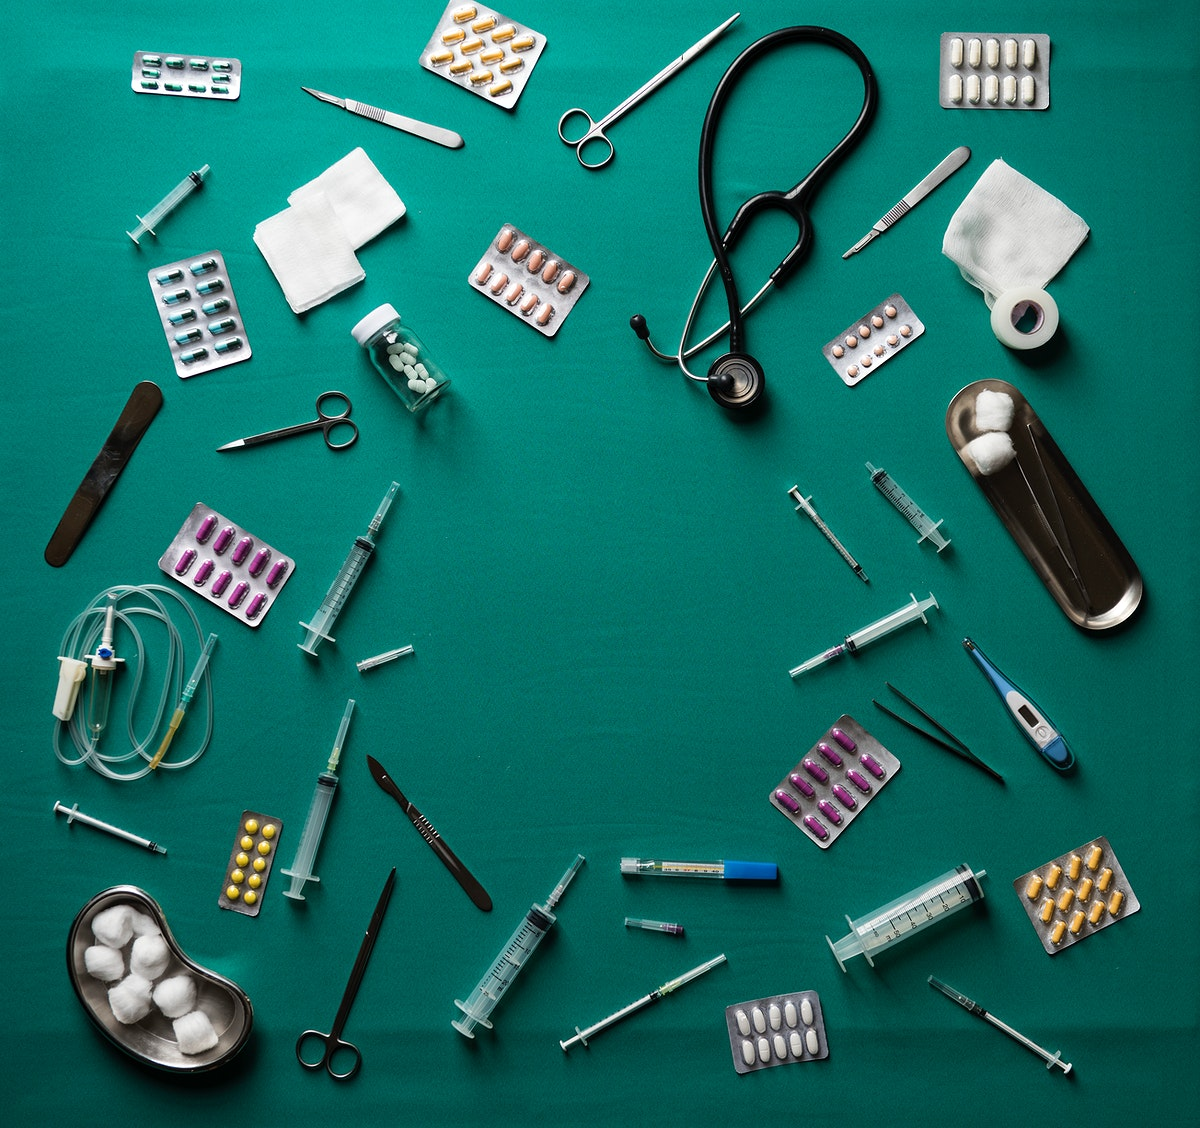 Medicine and medical equipment